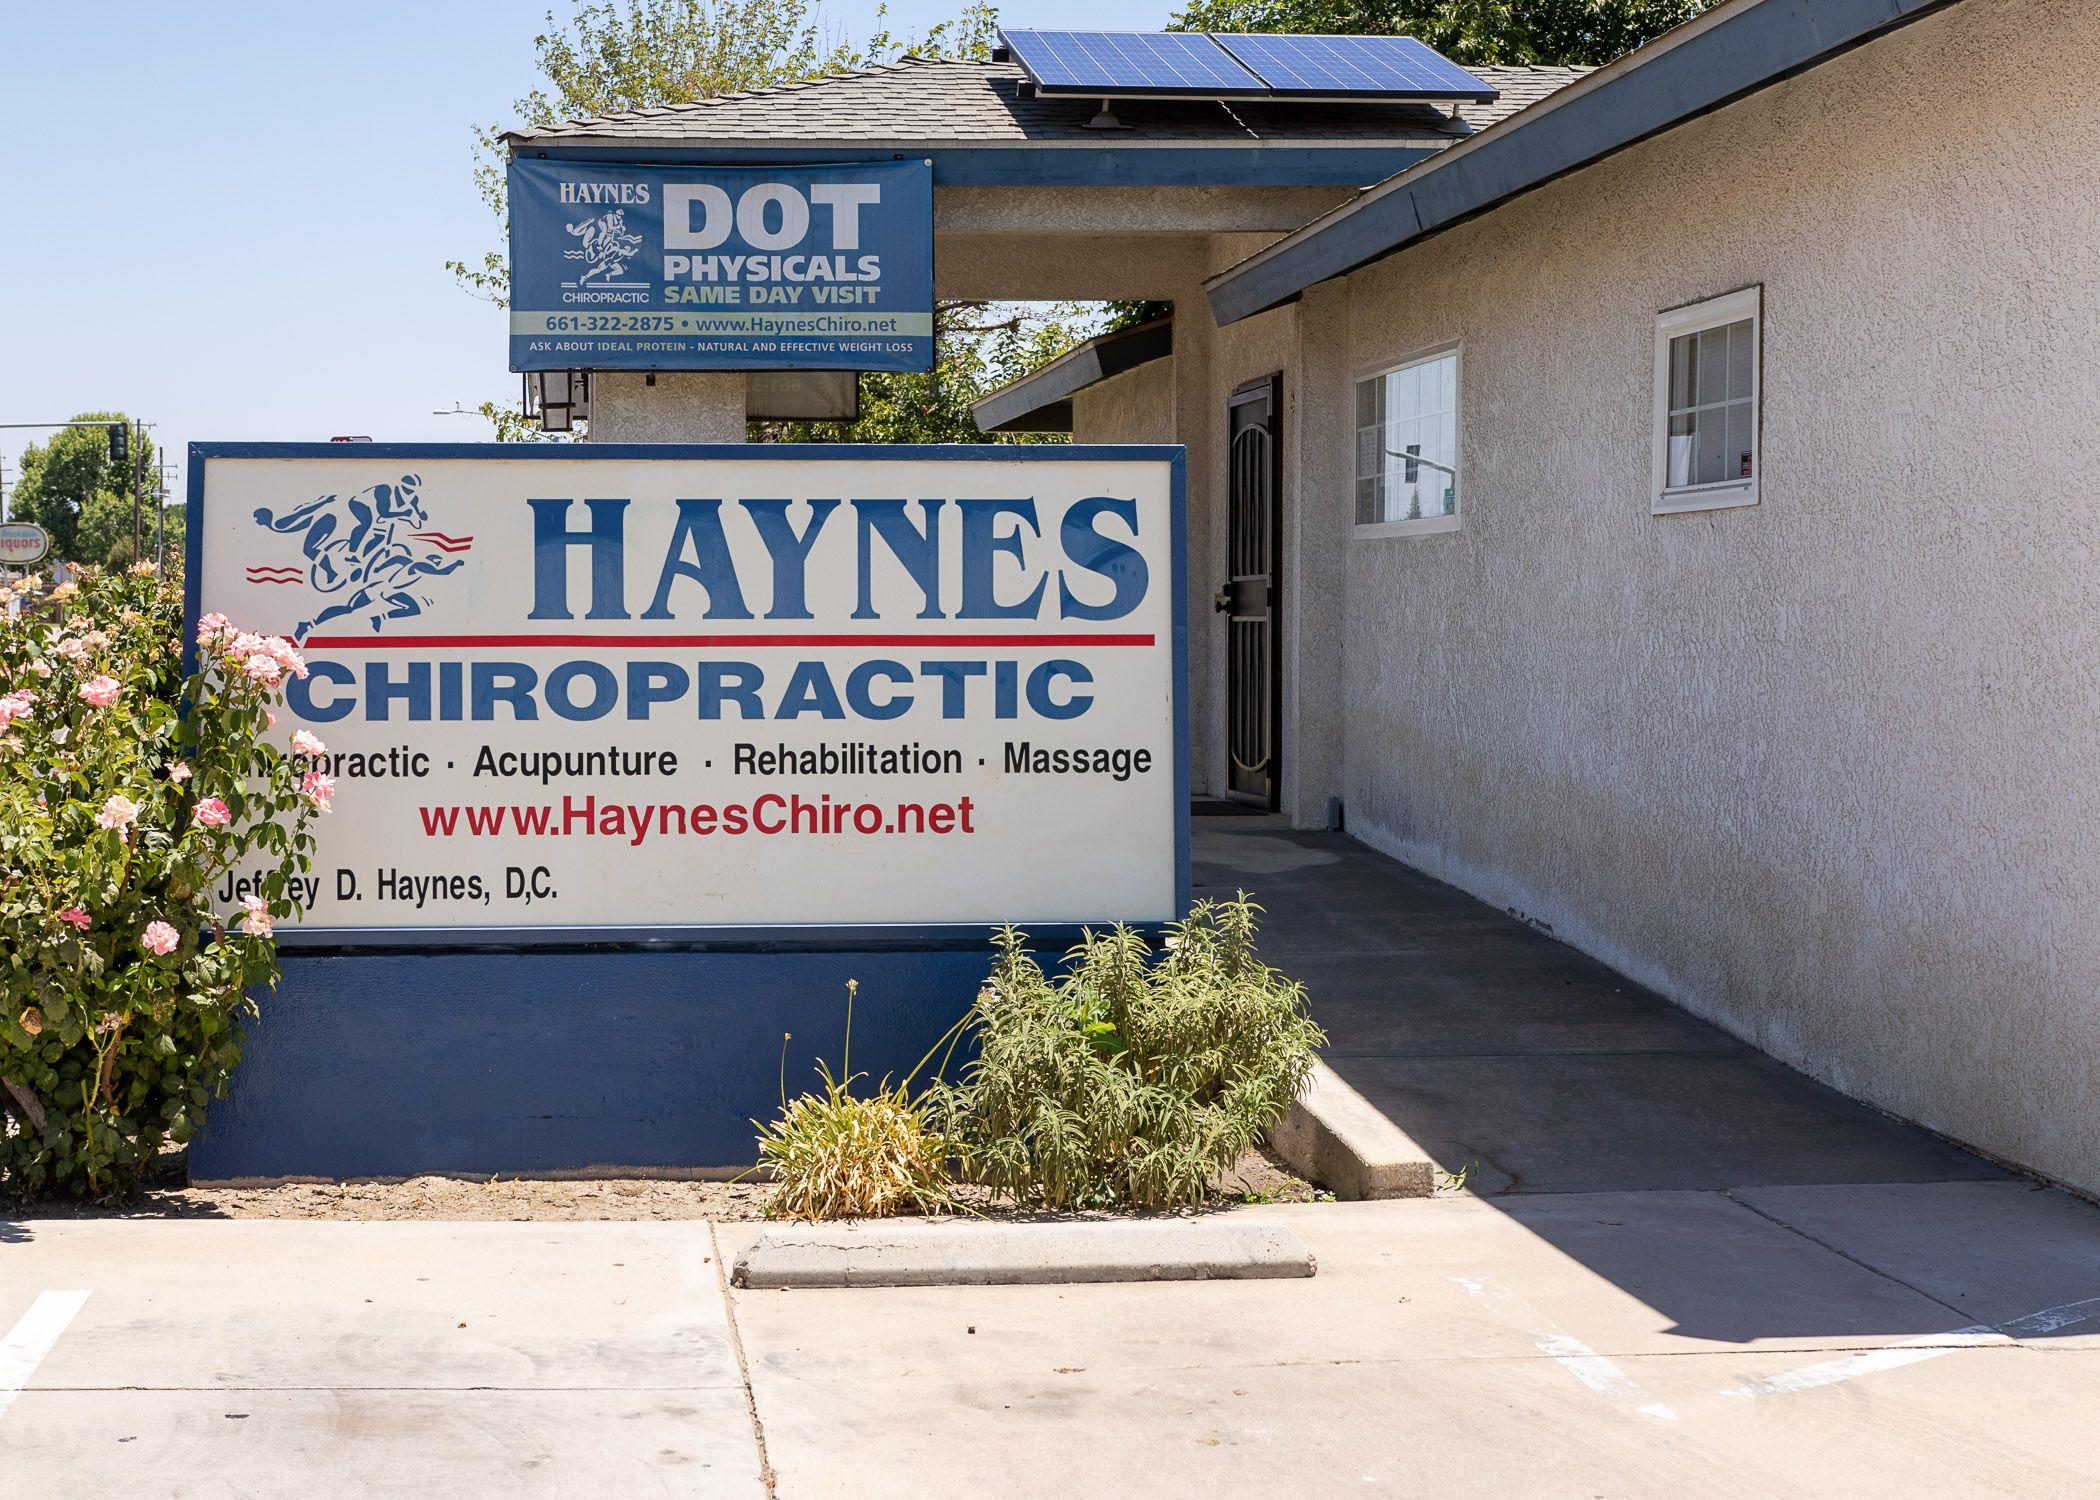 Chiropractic examinations building